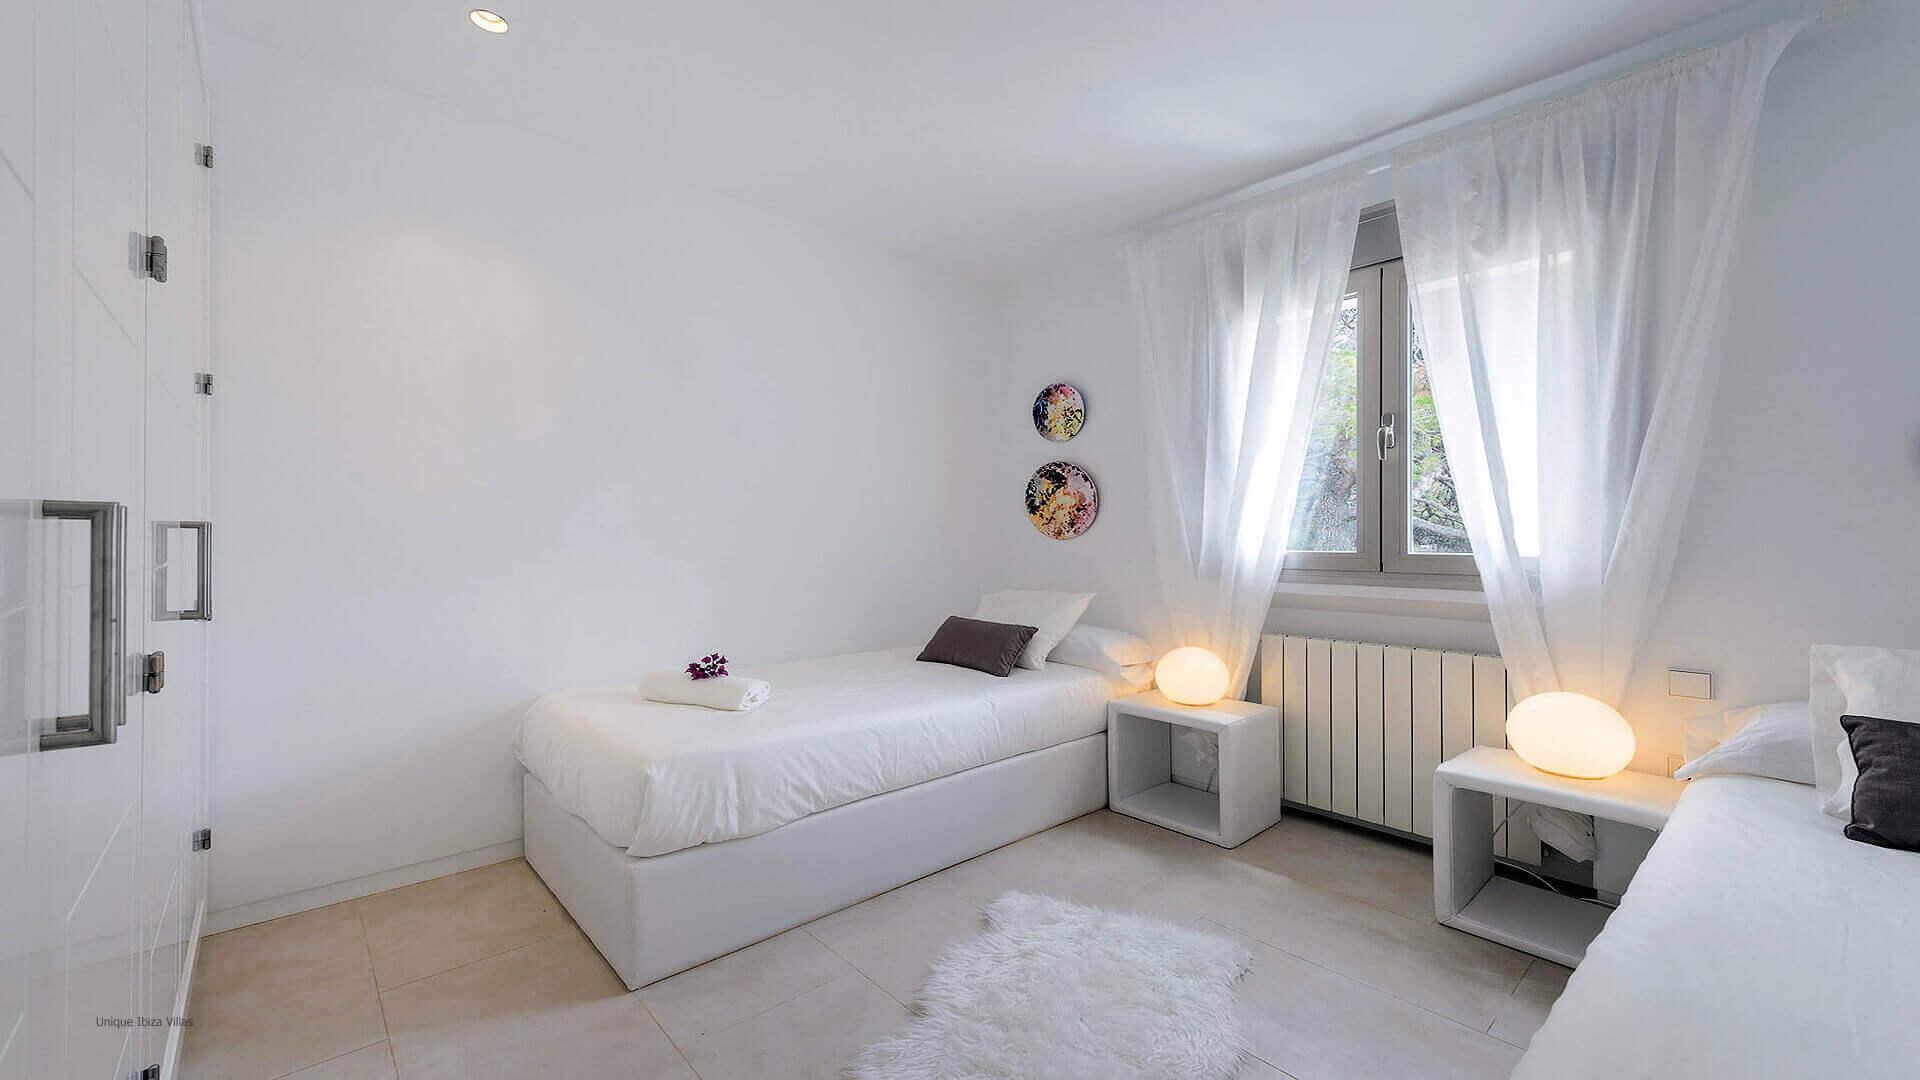 Villa Montecristo Ibiza 35 Bedroom 3